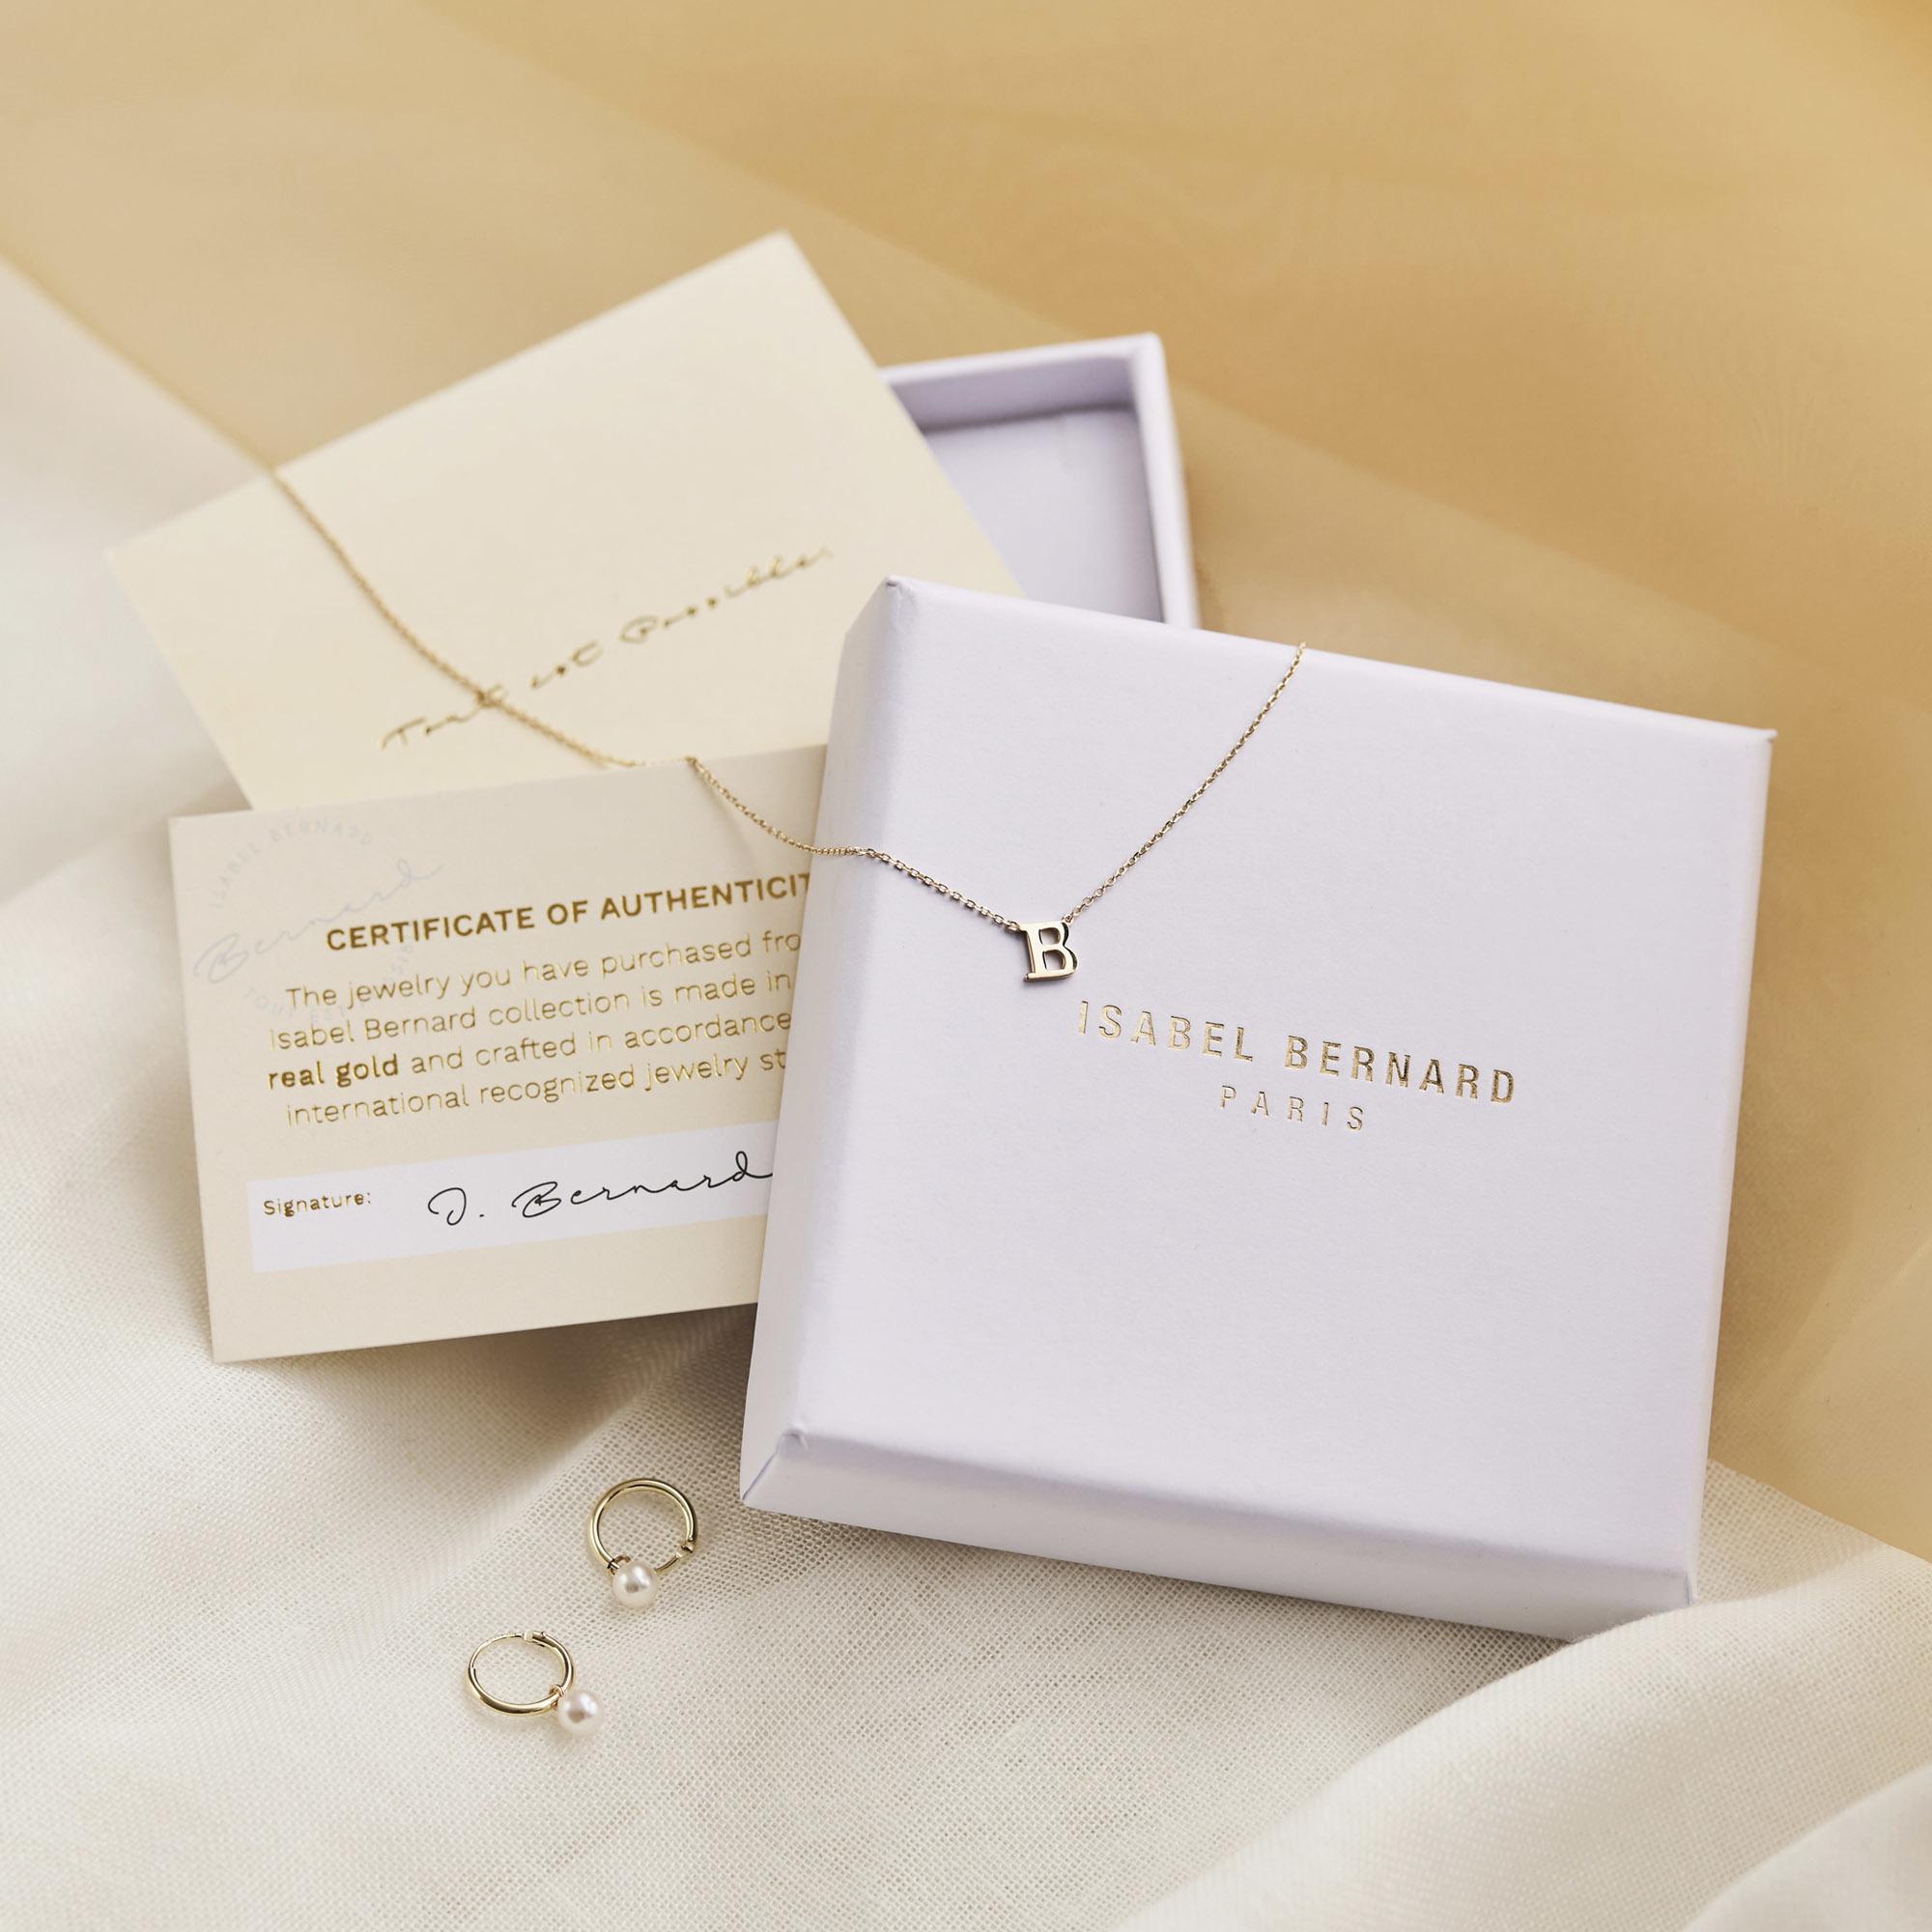 Isabel Bernard Saint Germain Rachel bracelet initiale en or blanc 14 carats